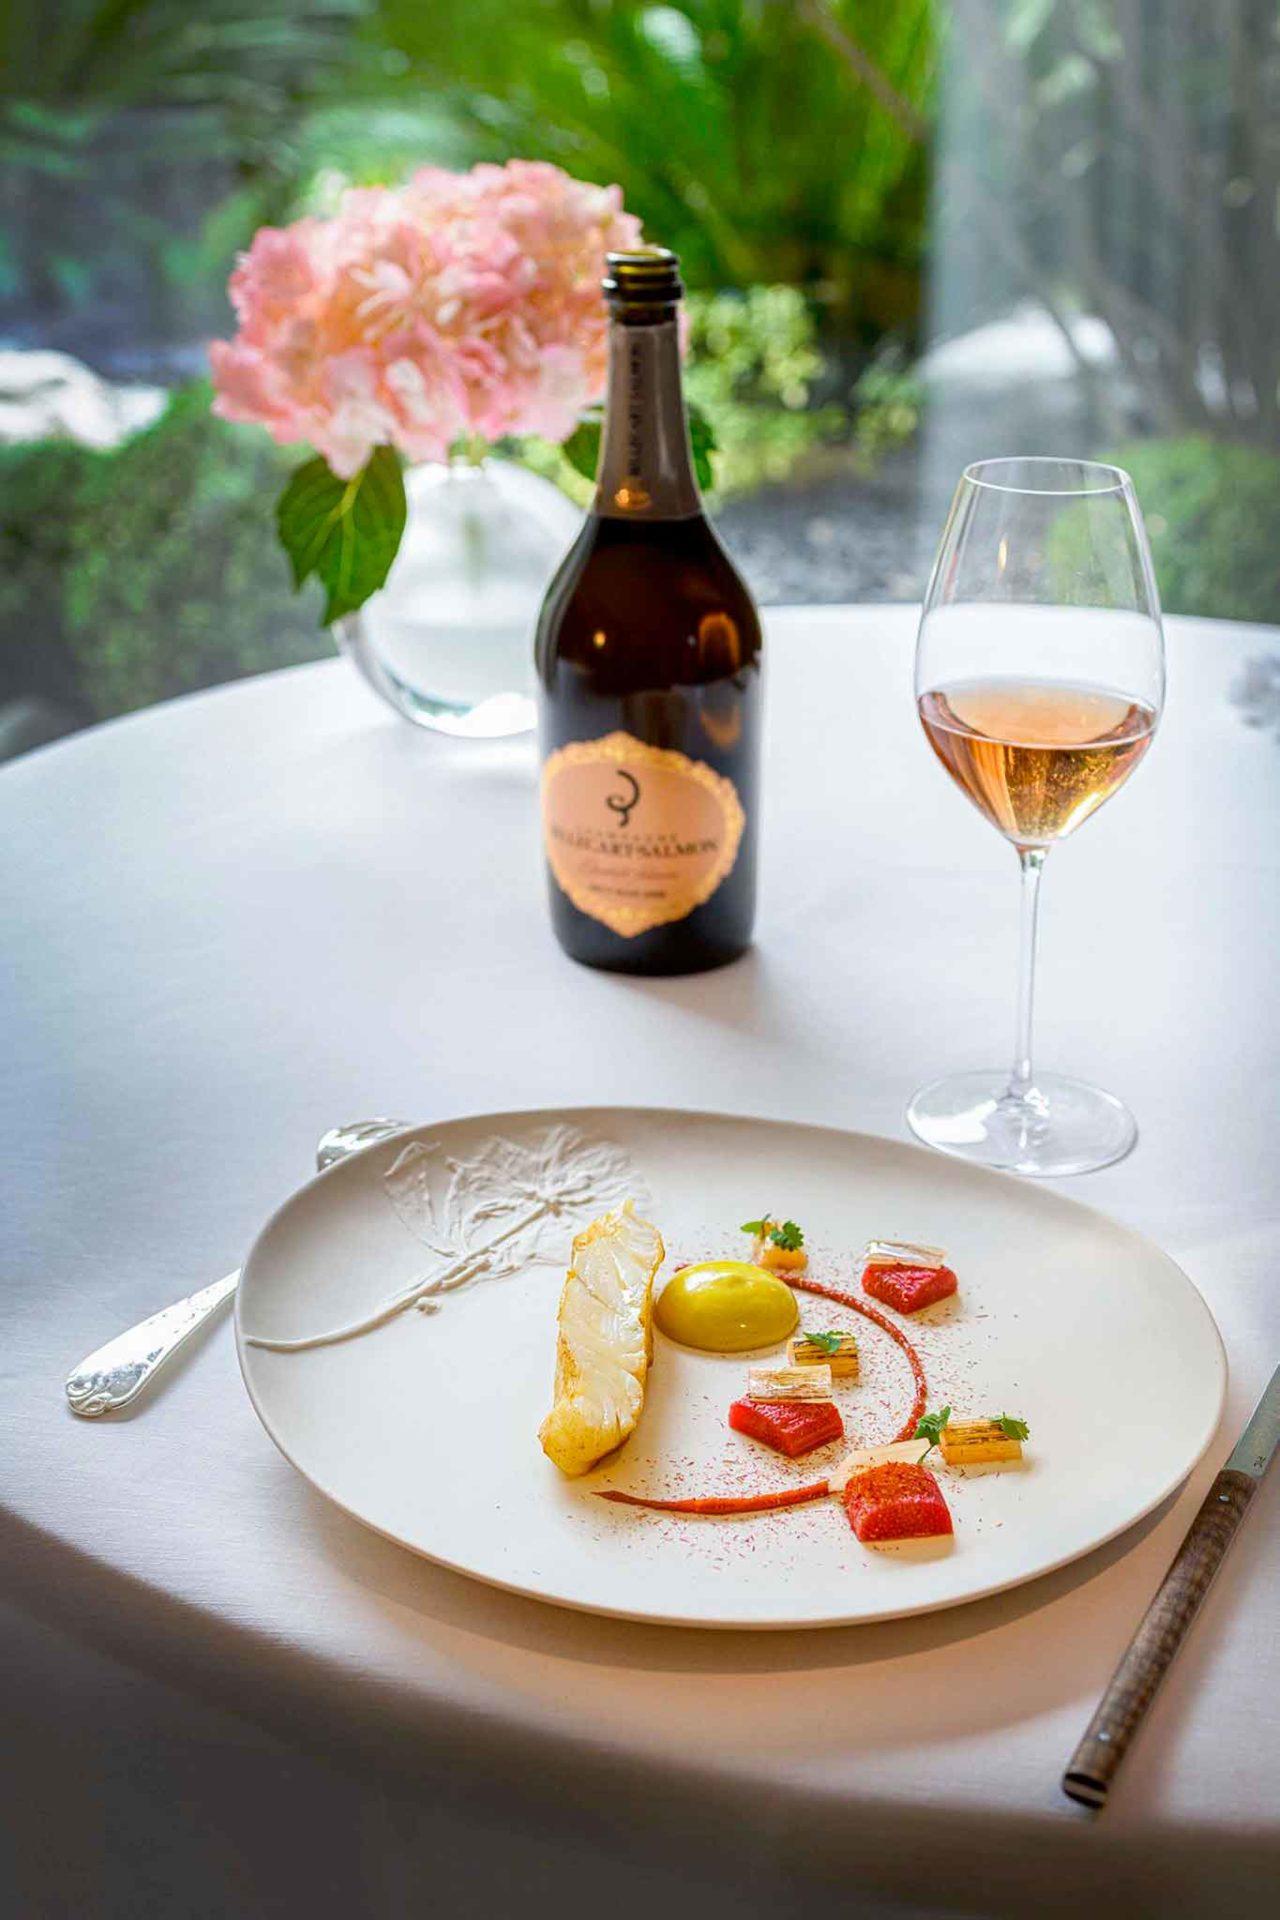 champagne Billecart-Salmon Elisabeth Salmon Brut Rosé 2008 piatto